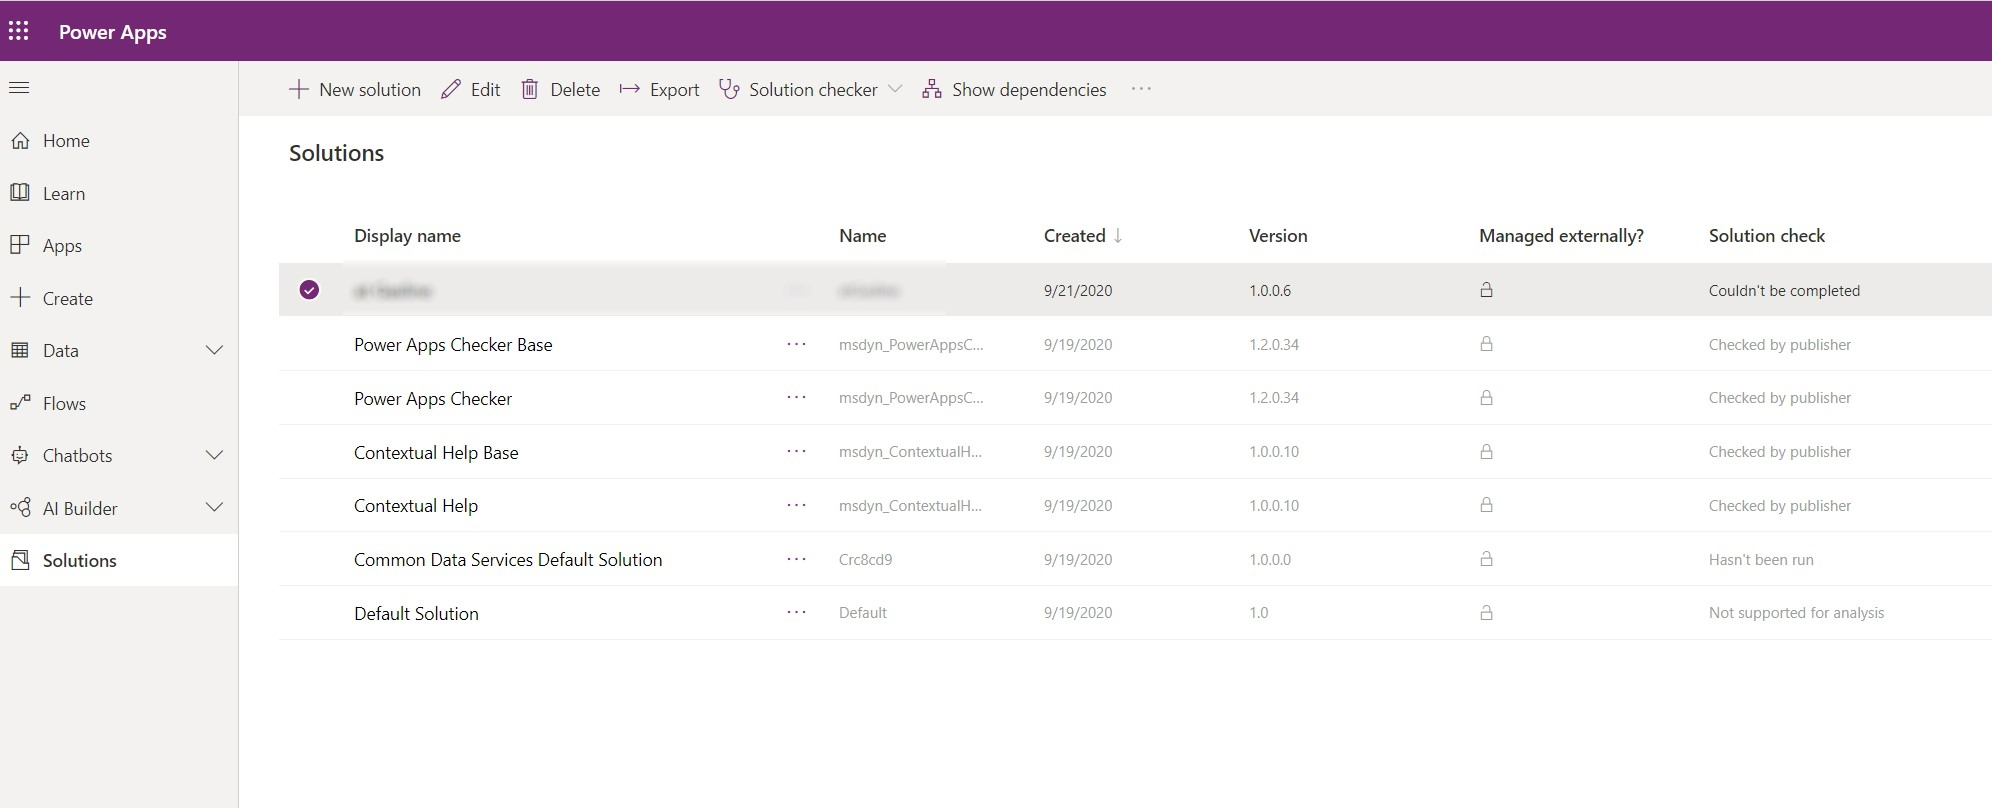 Screenshot 2020-09-22 0752271